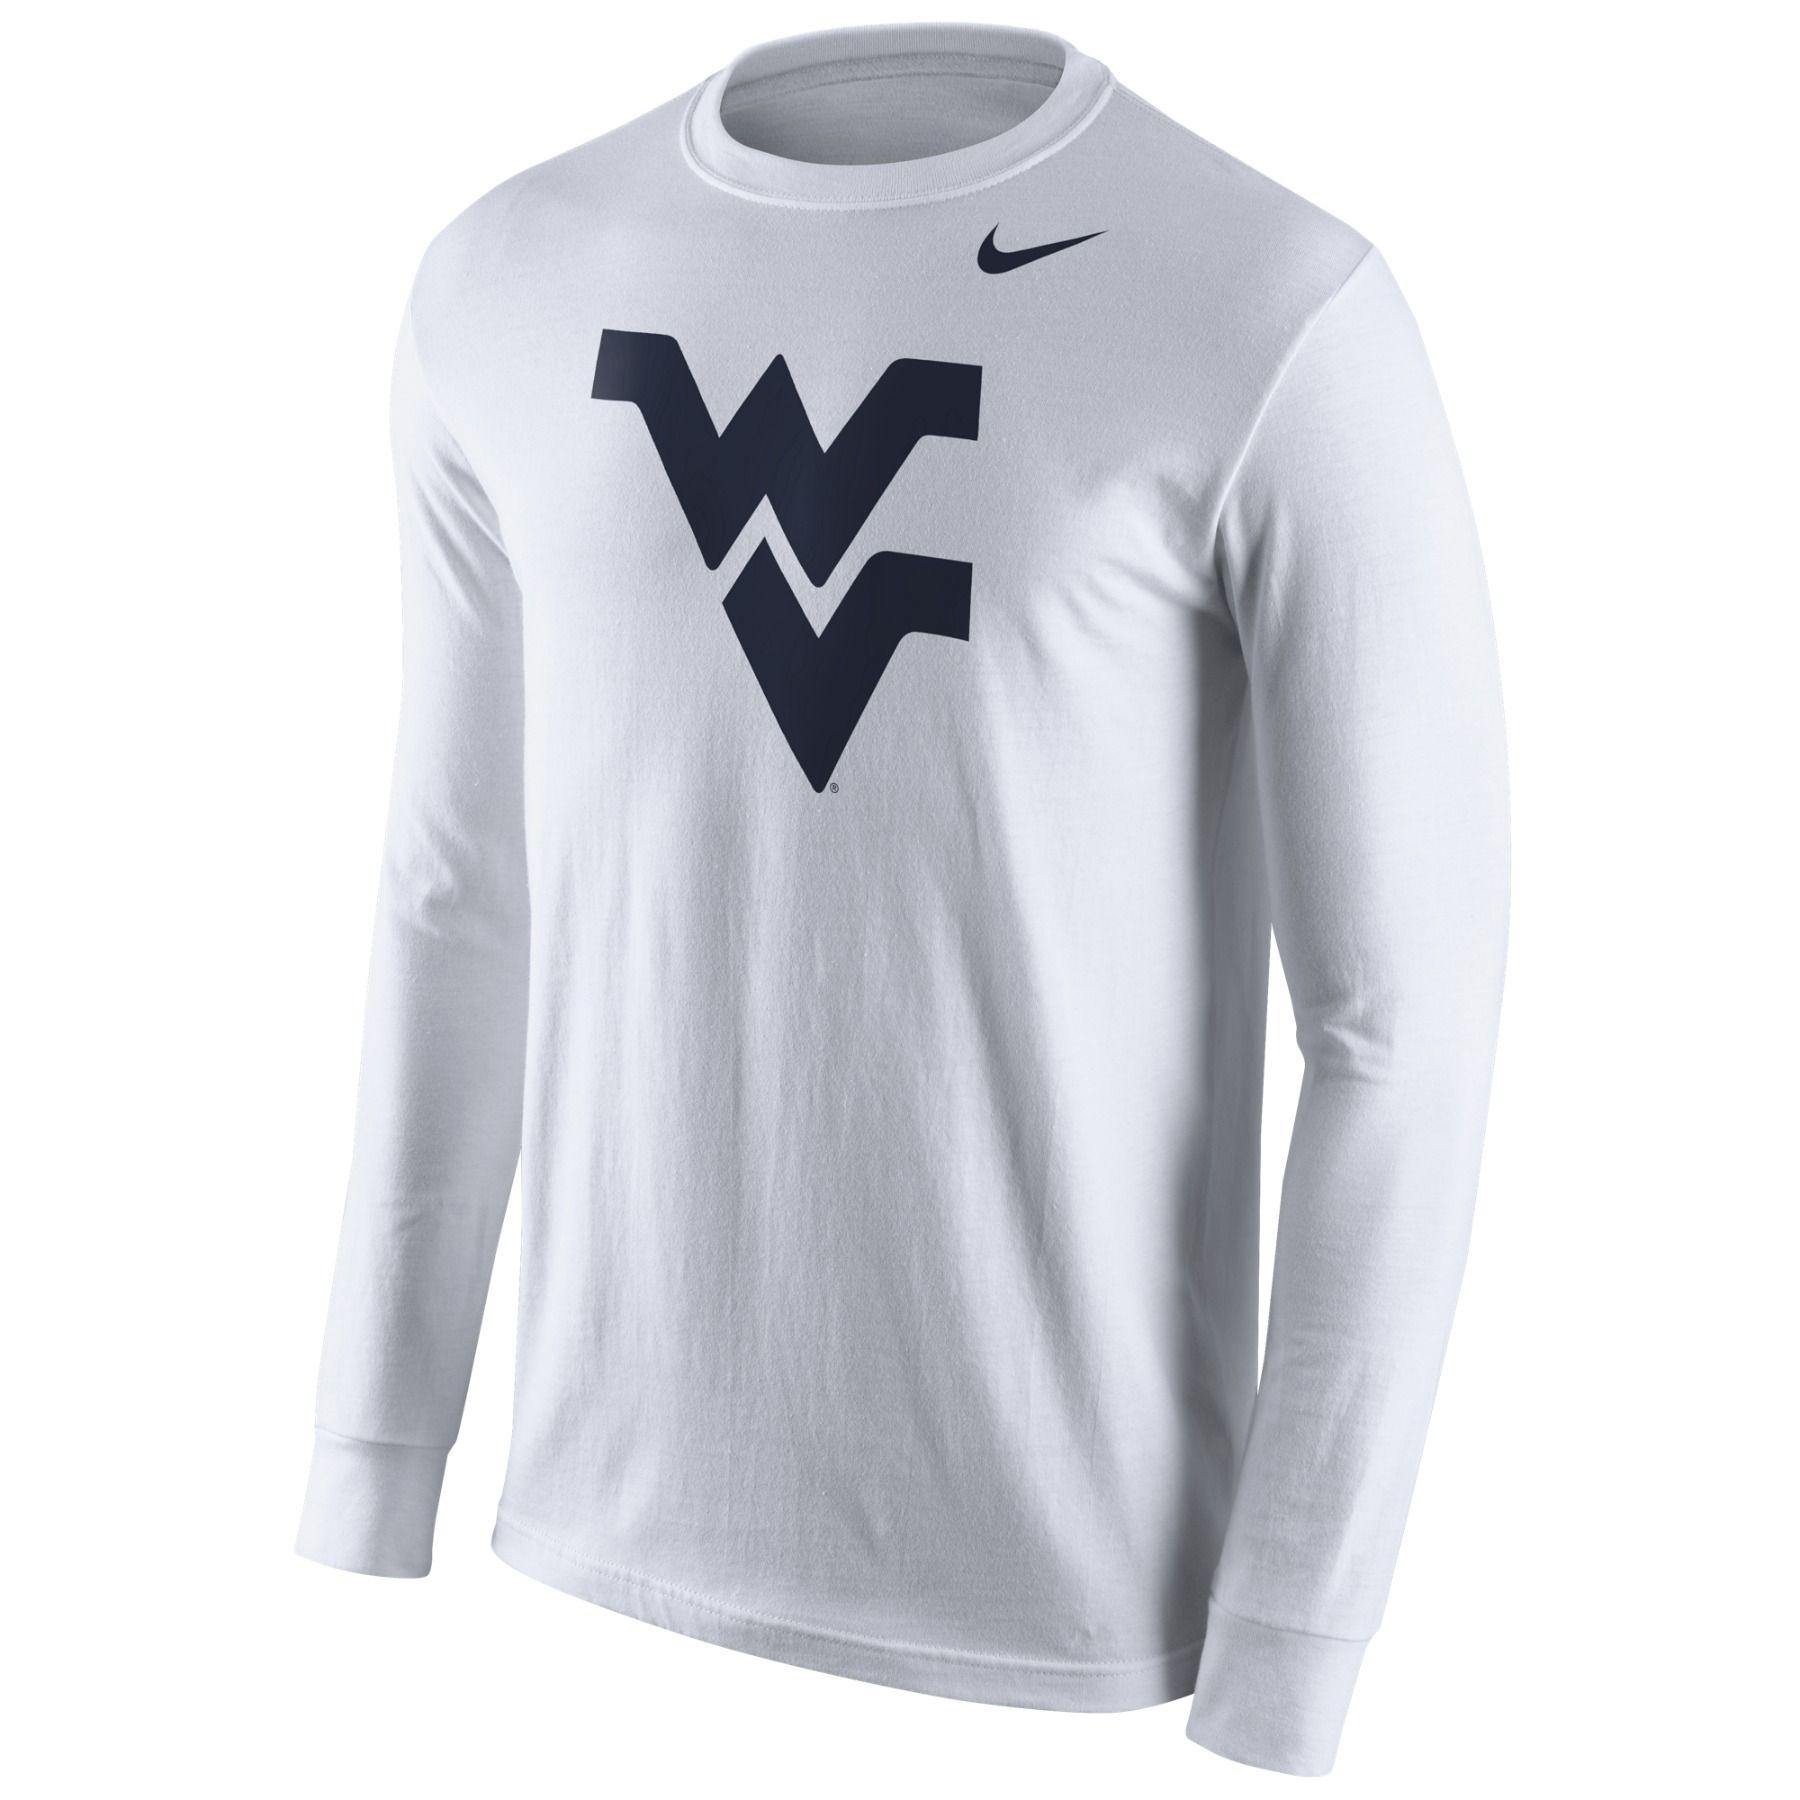 Nike WV Logo White Long Sleeve Tee